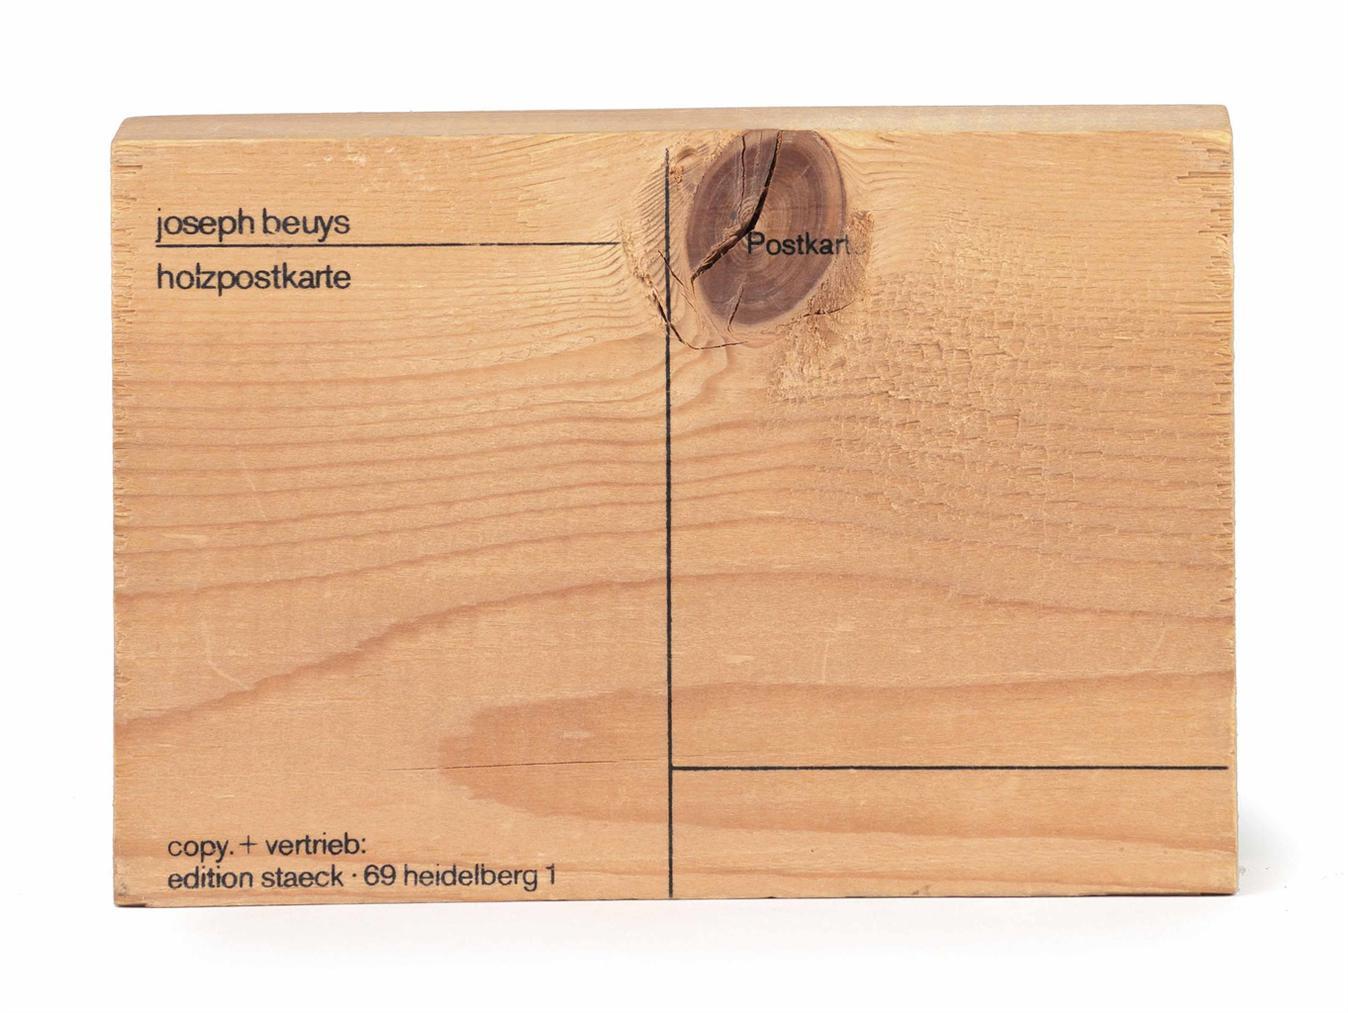 Joseph Beuys-Holzpostkarte (Wood Postcard)-1974